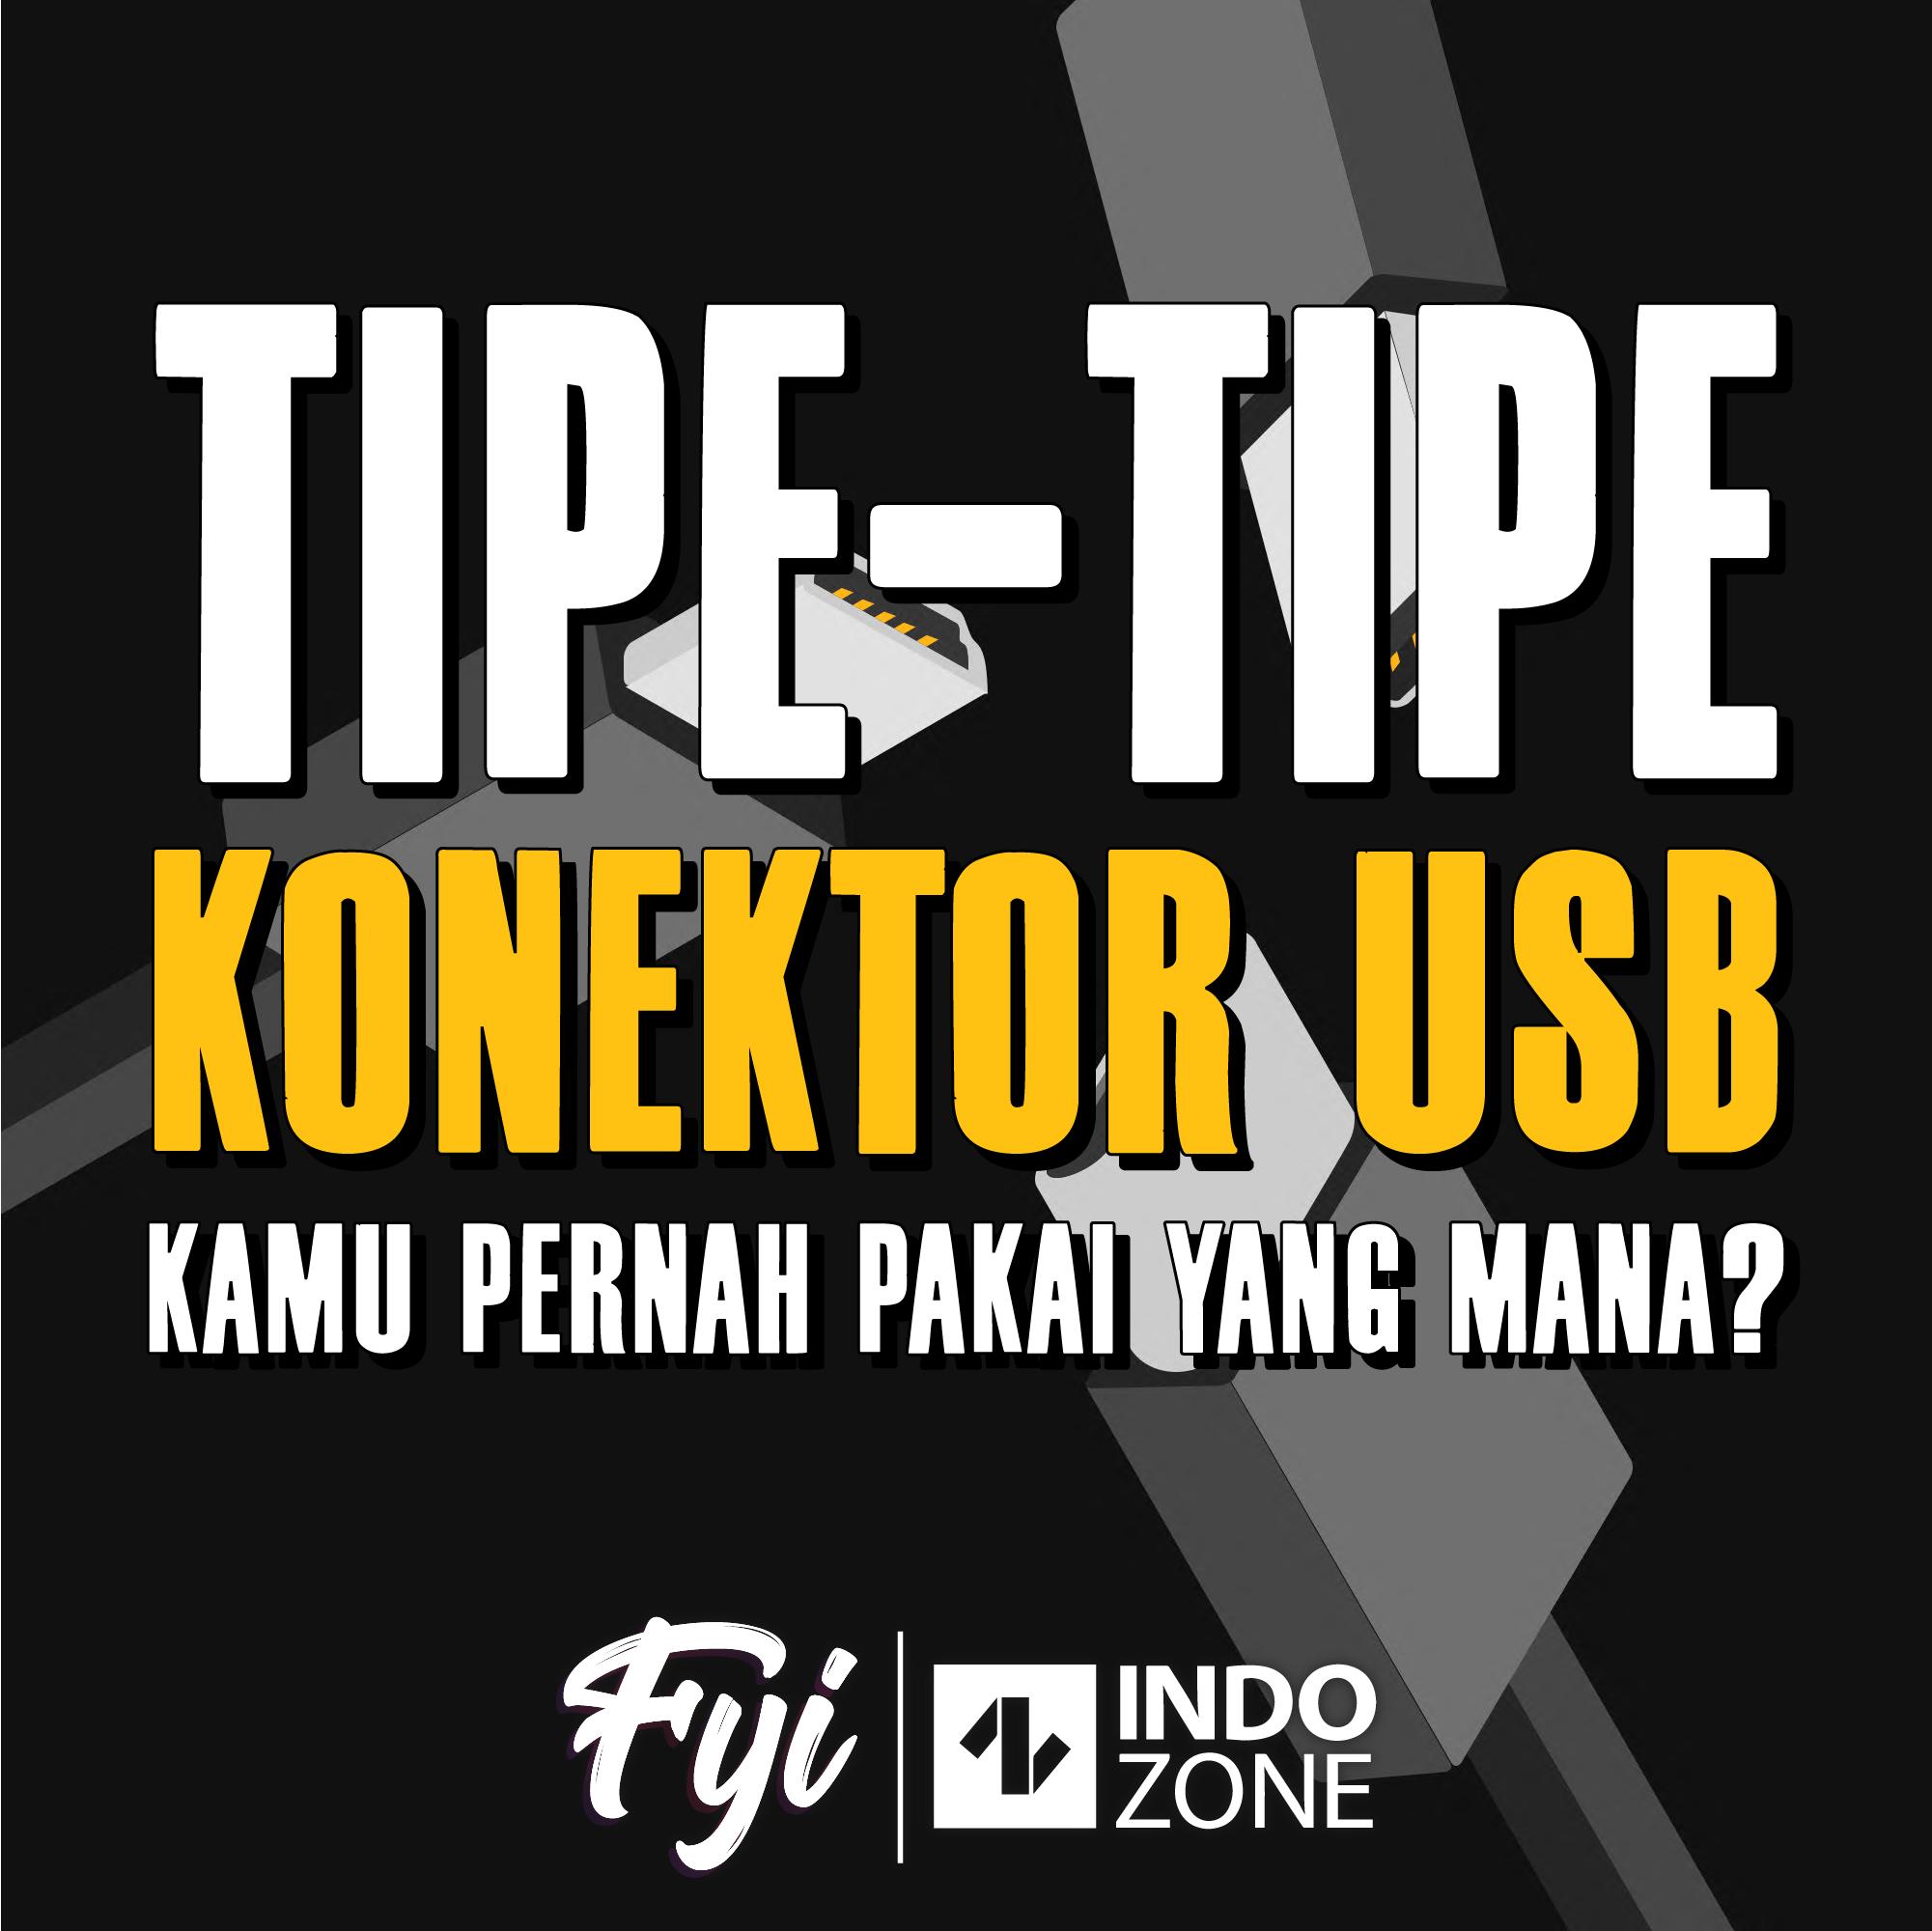 Tipe-Tipe Konektor USB, Kamu Pernah Pakai yang Mana?